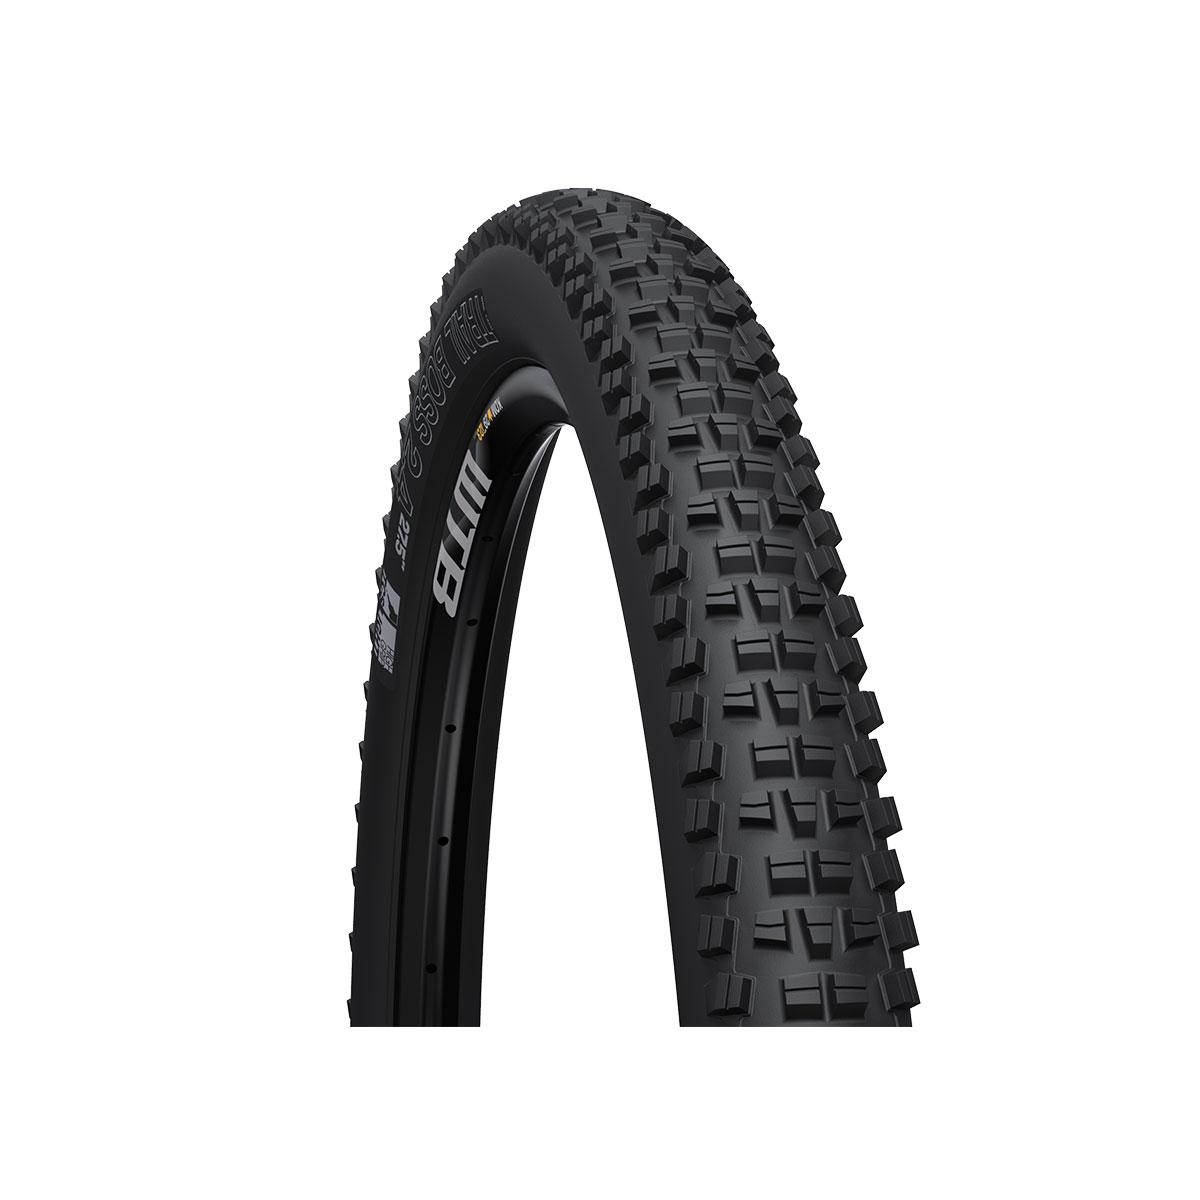 "WTB Trail Boss Light/High Grip Tire 2.4 x 27.5"""